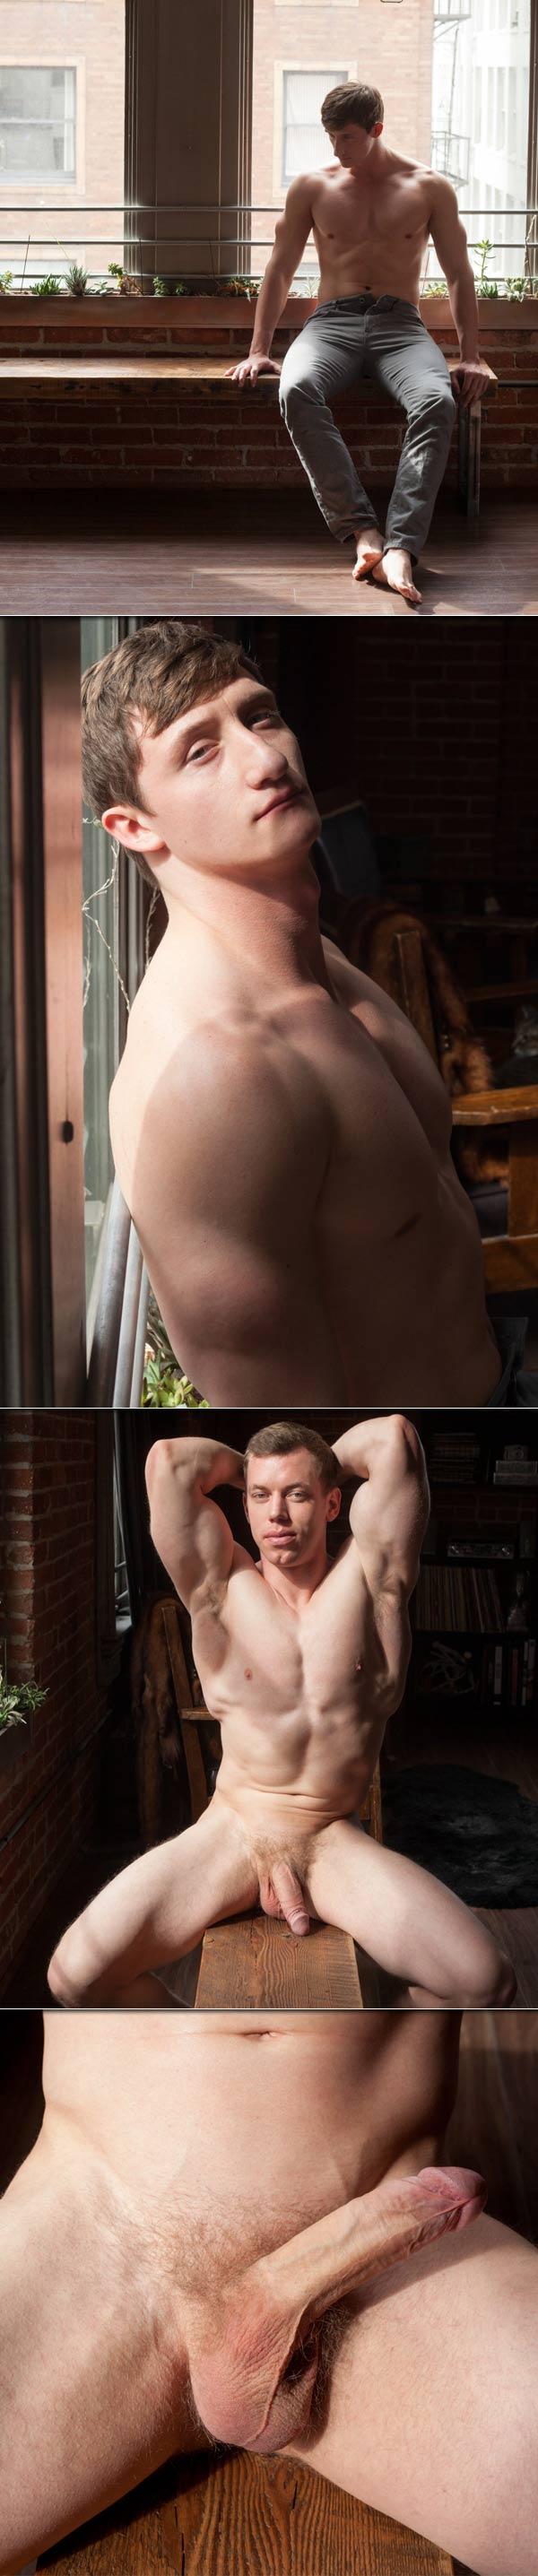 Adam Hardy Porn randyblue: adam hardy & lance alexander (hot and sweaty